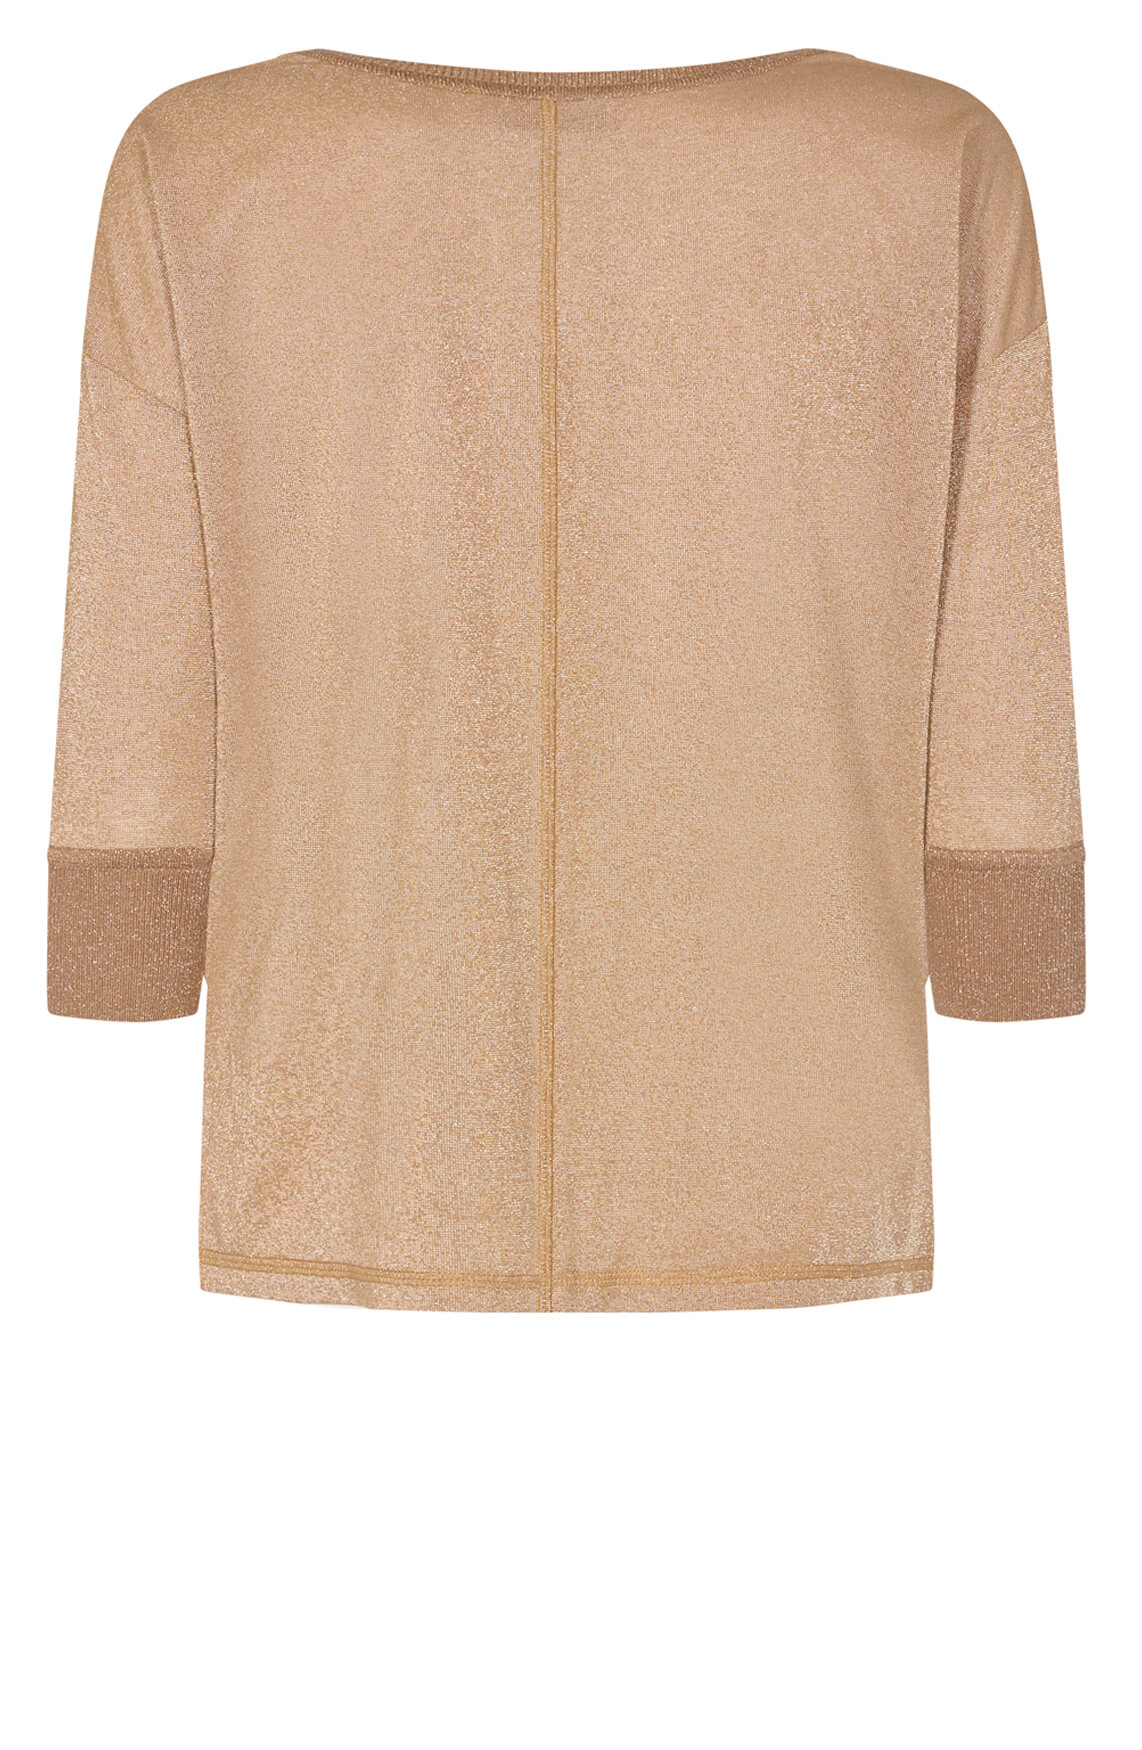 Mos Mosh Dames Kiara shirt goud